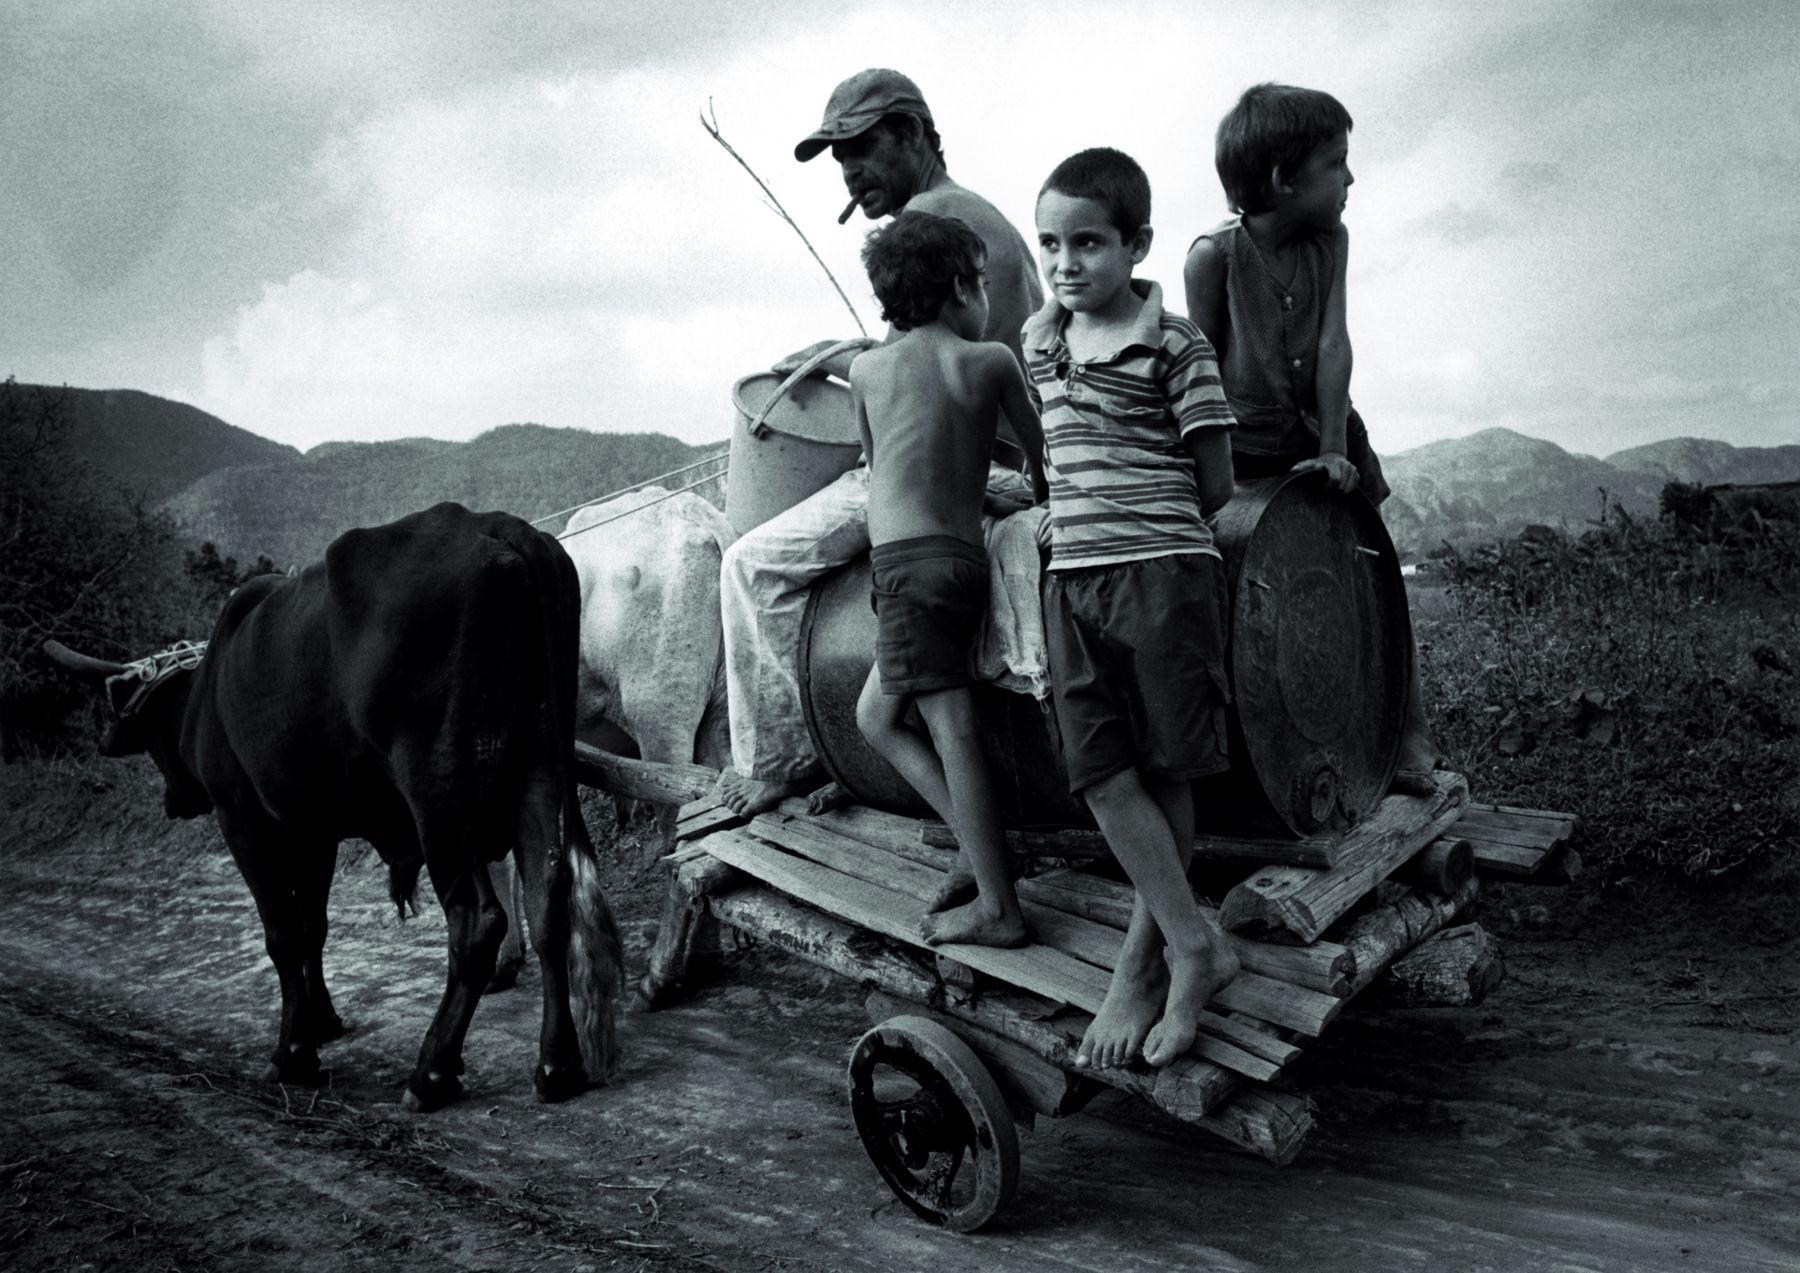 SUSAN S. BANK, Children on Oxen Cart, 2002-2007